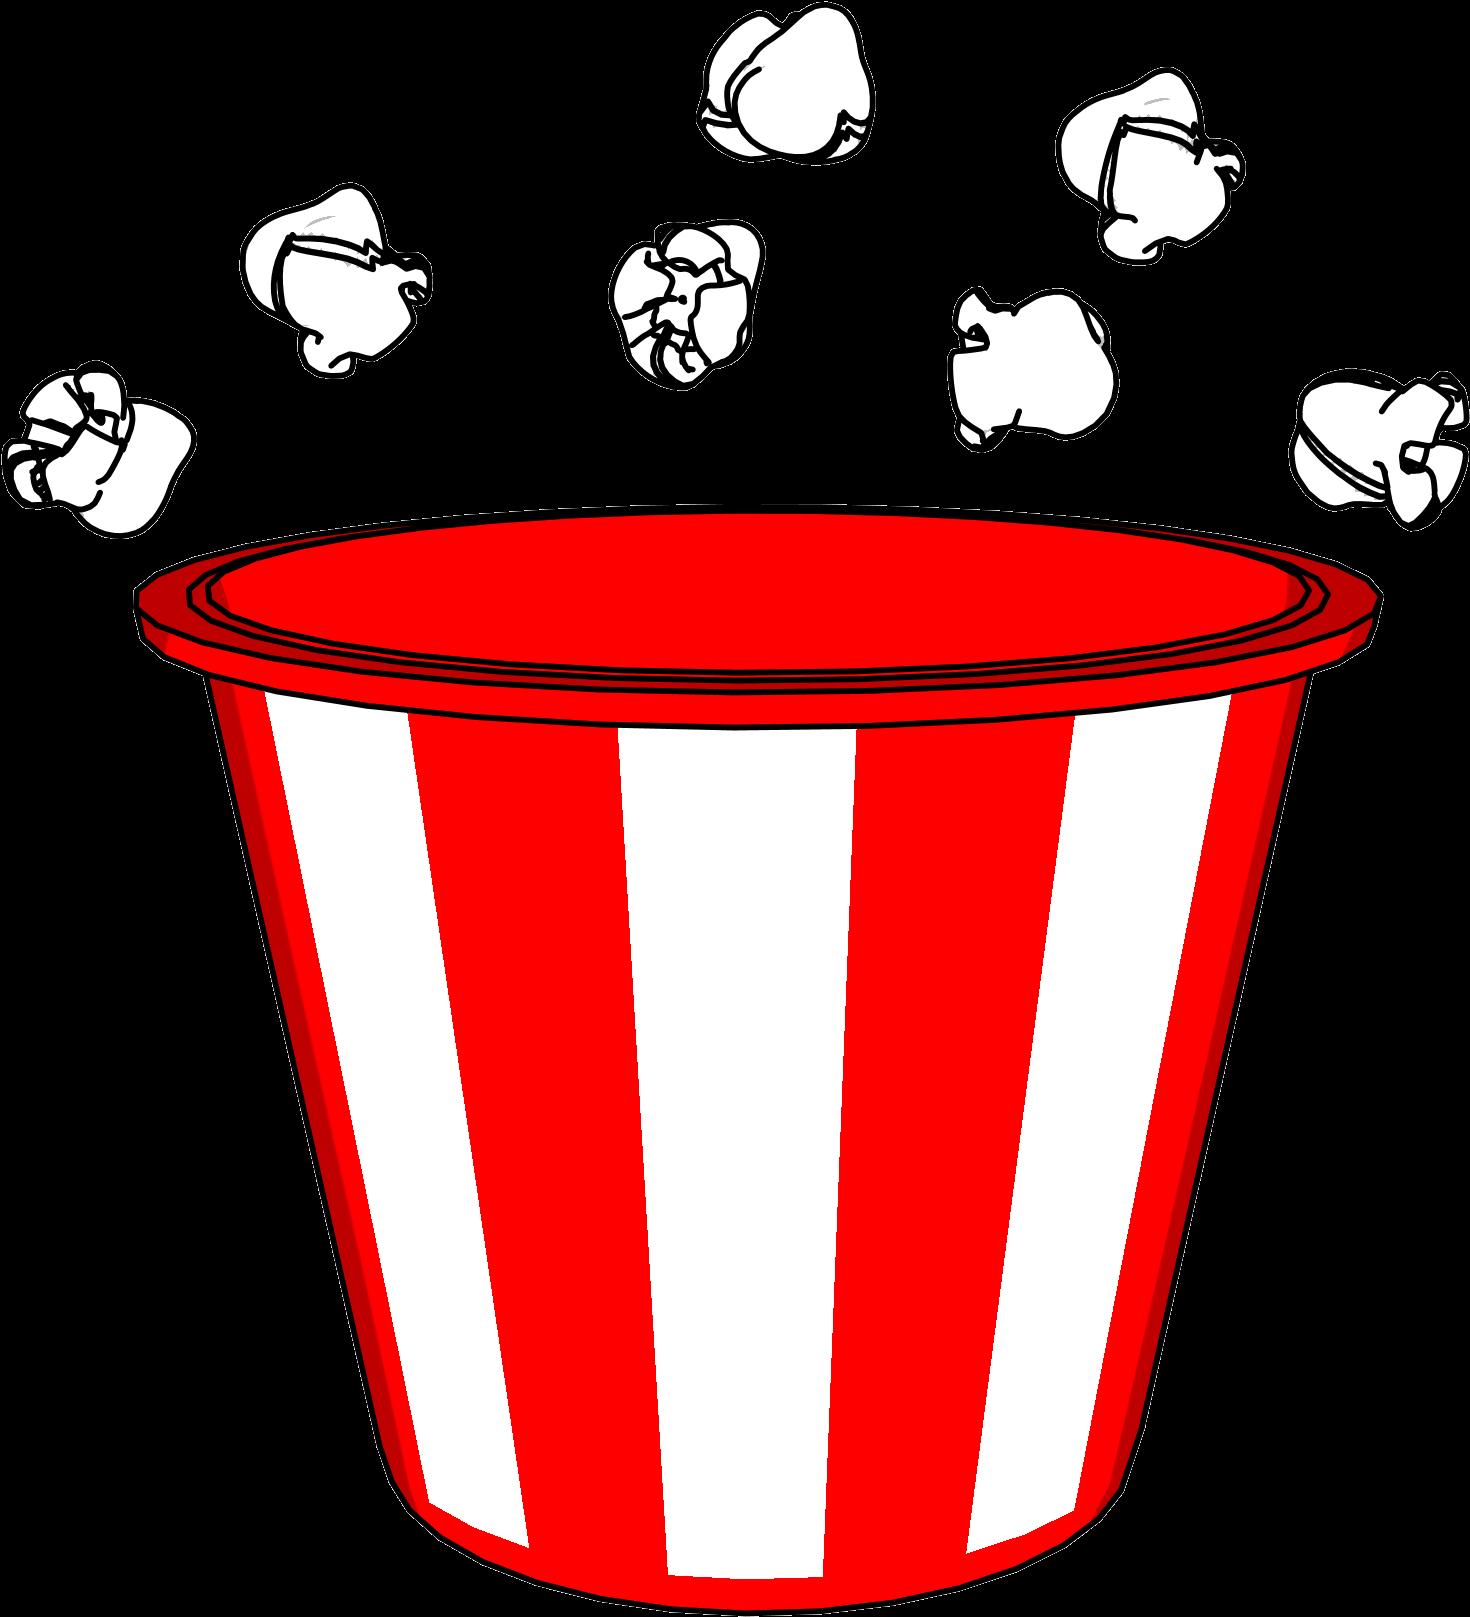 Balde clipart clip black and white library HD Popcorn Bucket And Pop Clipart Png - Balde De Pipoca Desenho ... clip black and white library